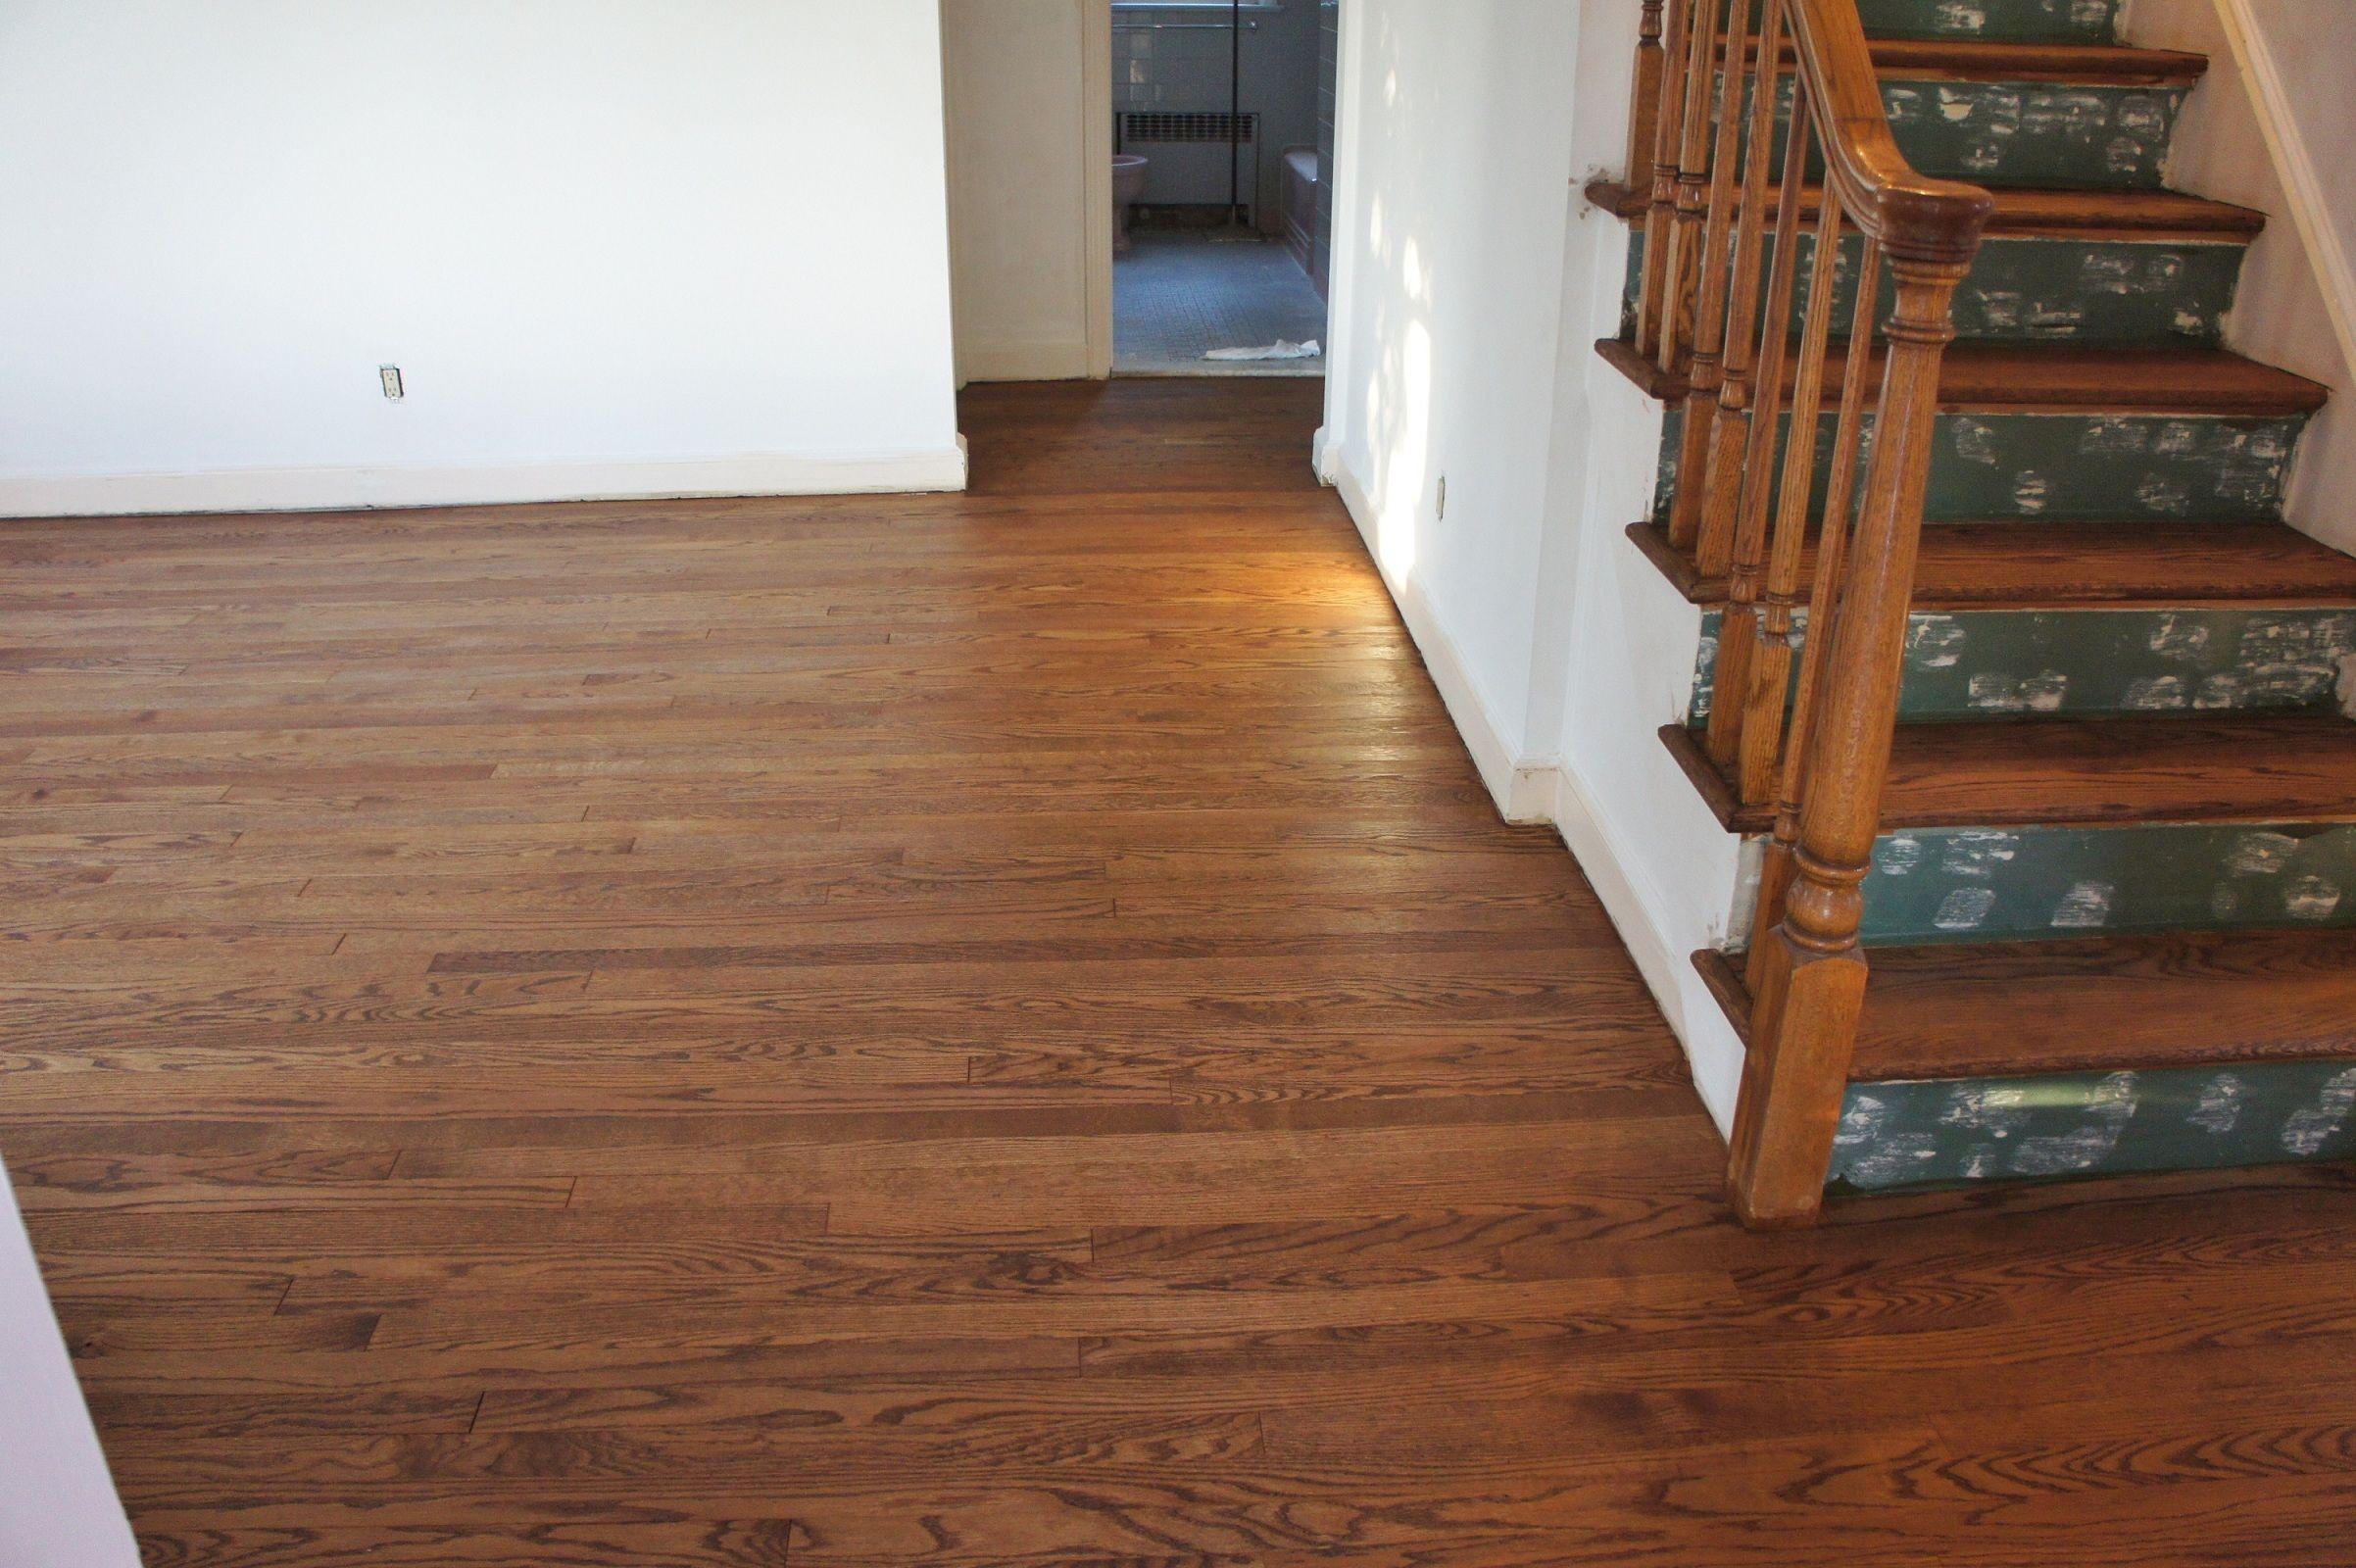 refinishing wood floors with water stains (mit Bildern)